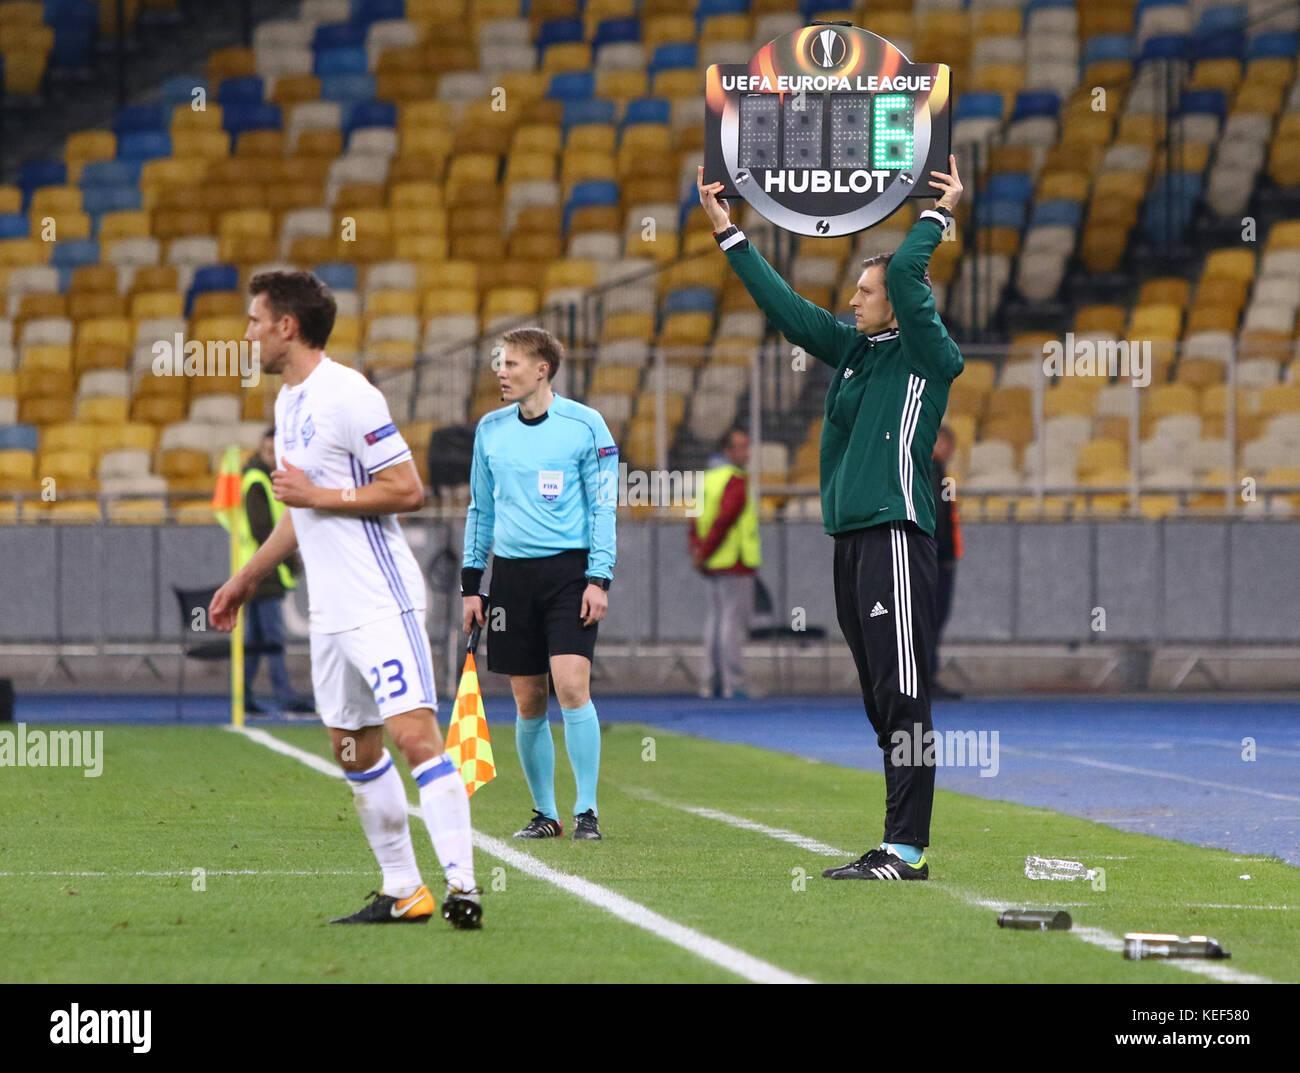 Kiev, Ucrania. 19 oct, 2017. Cuarto árbitro jukka honkanen ...